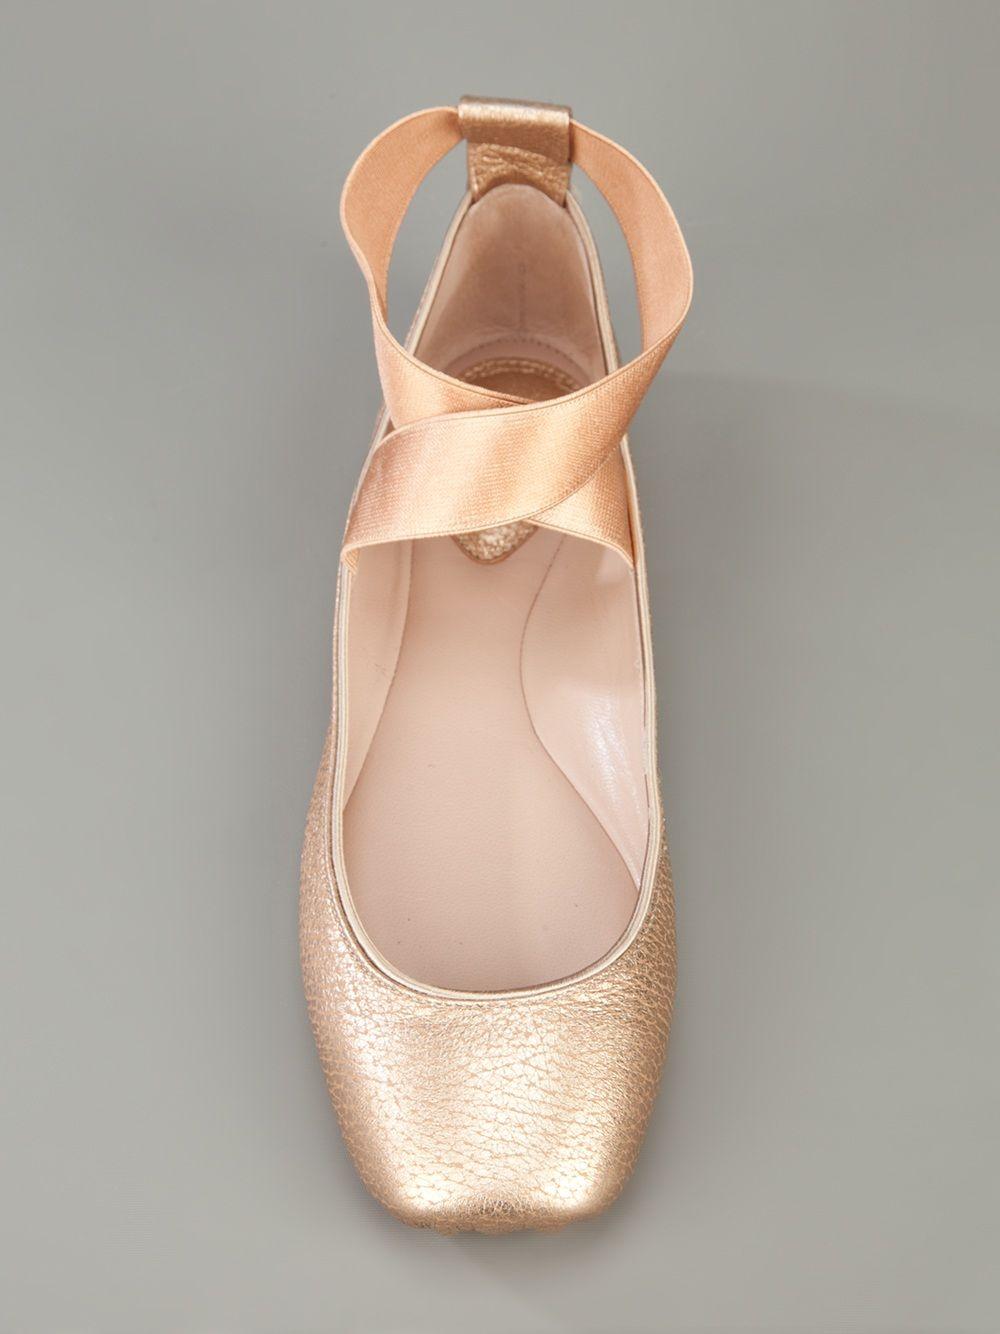 Chloe Ballet Flats, Ballerina Flats, Ballet Wedding Shoes, Flat Wedding  Shoes 82868817560